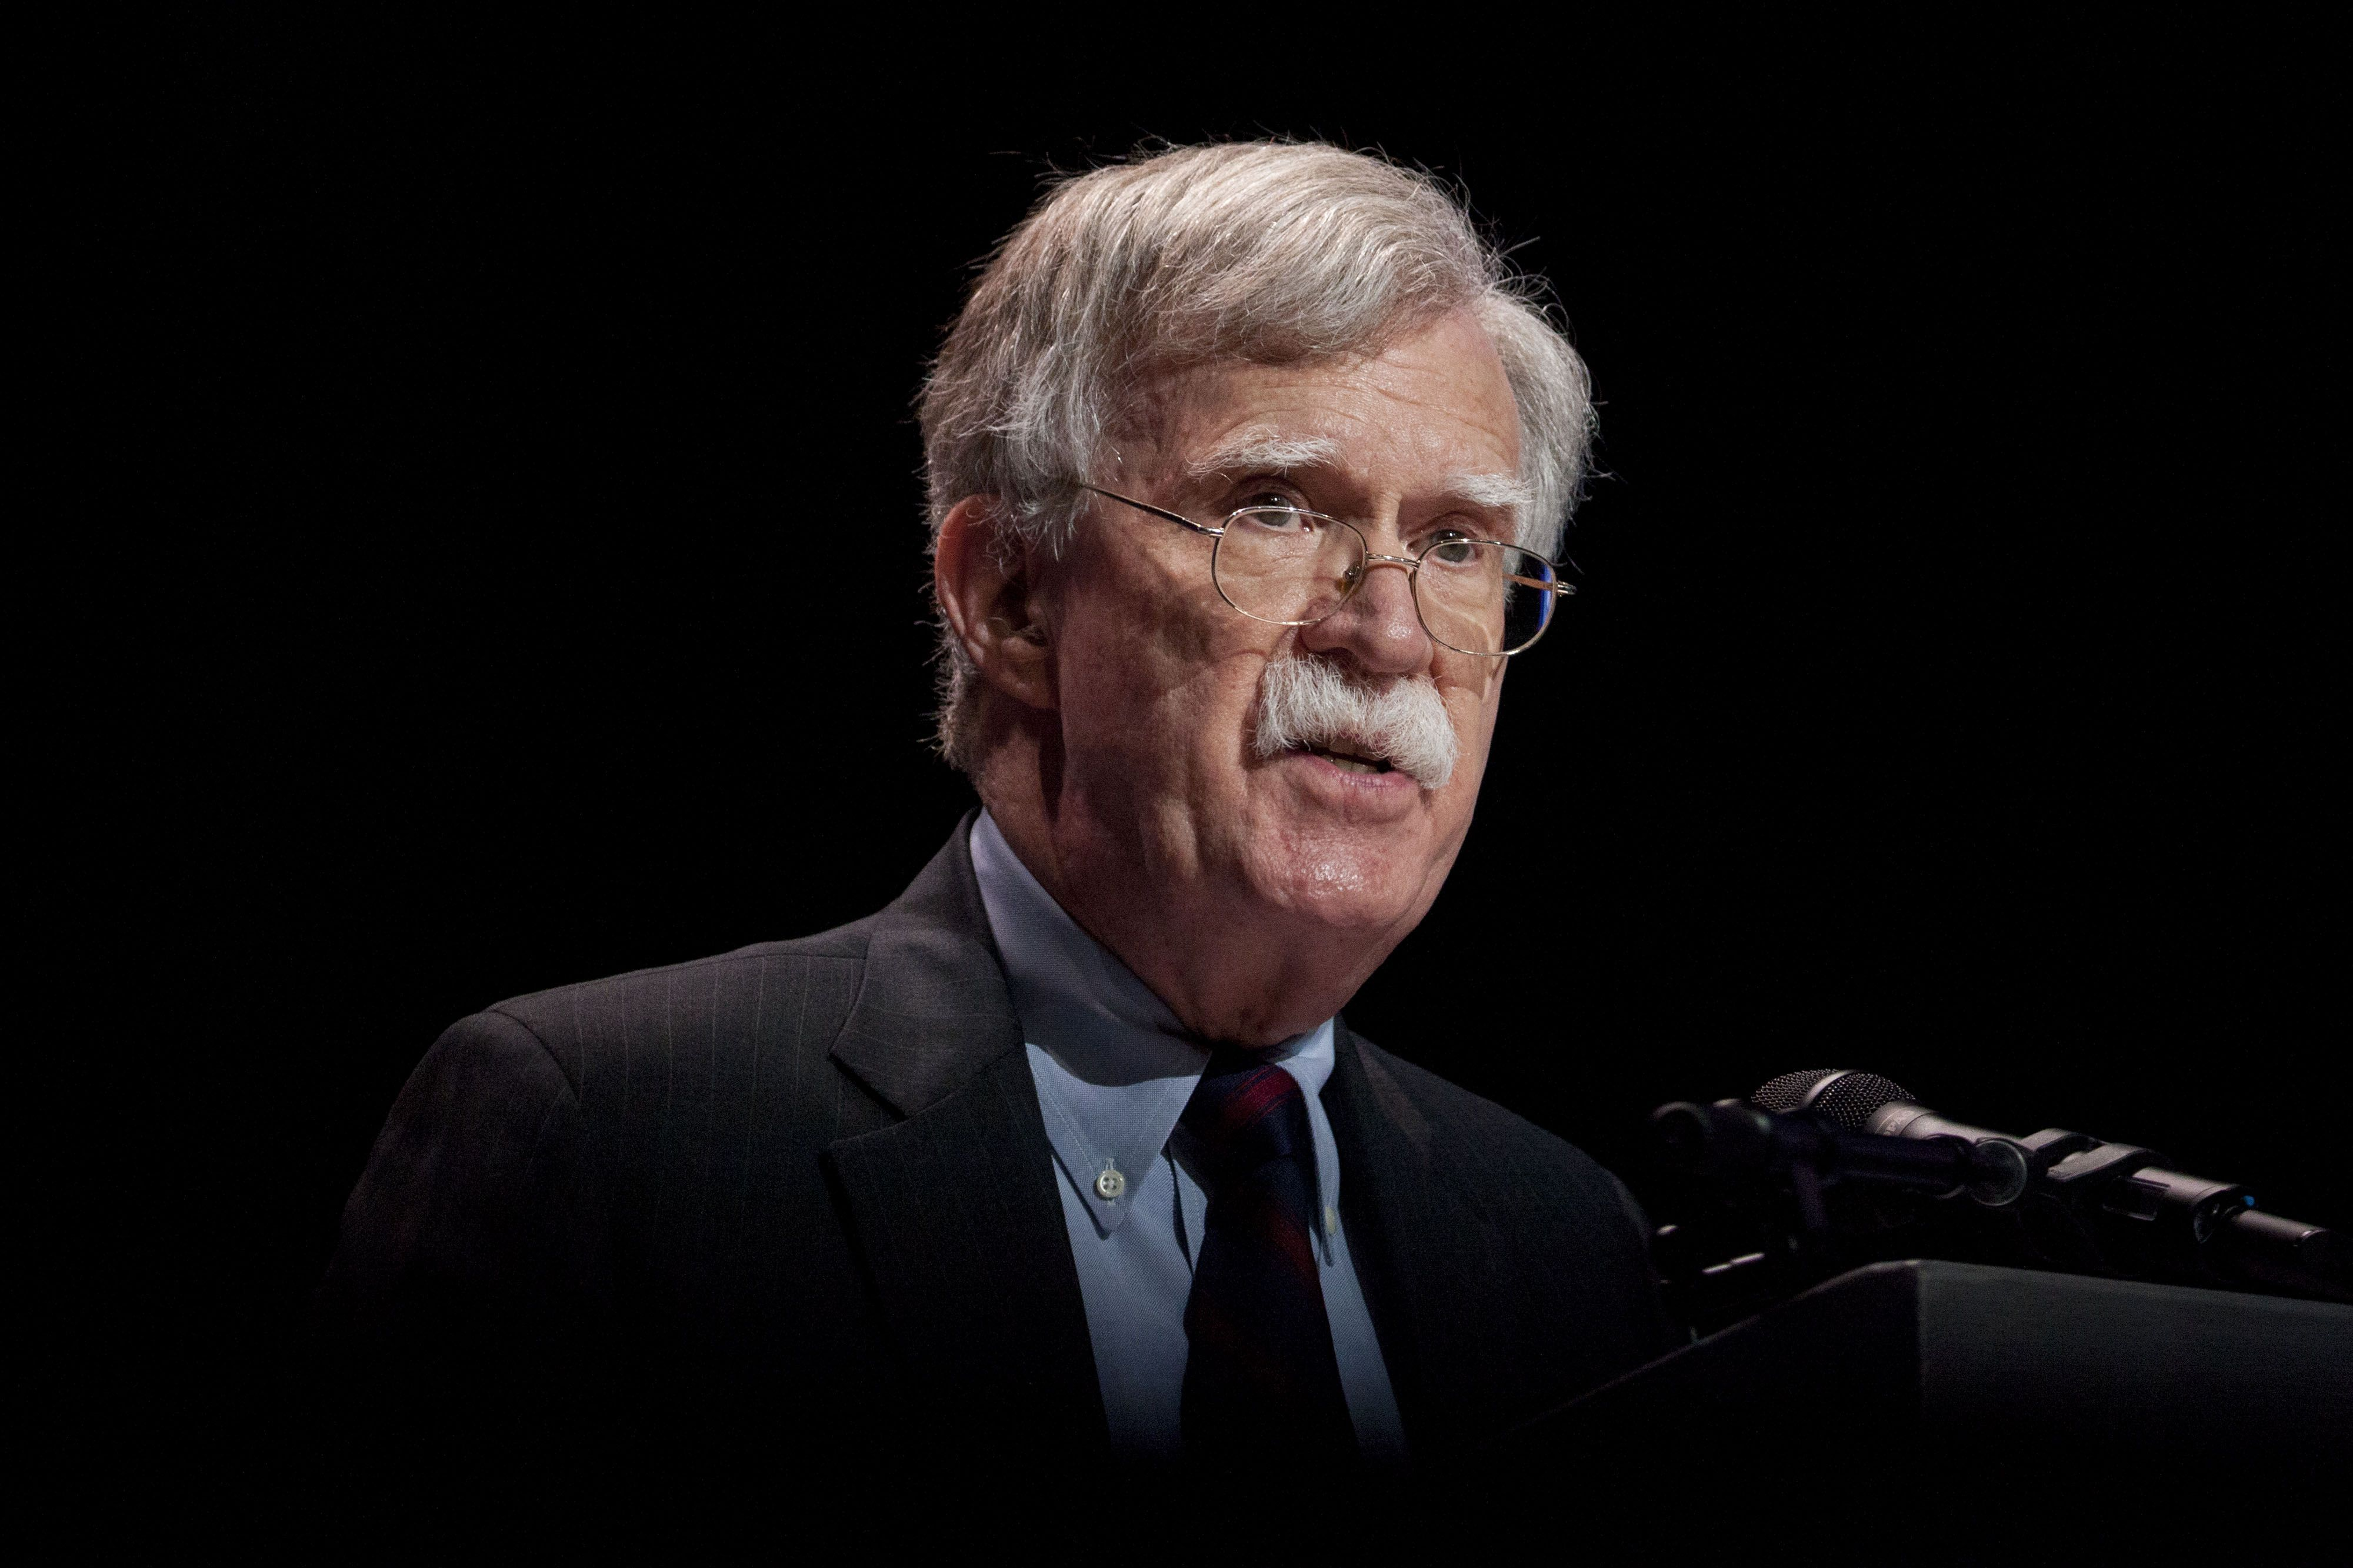 John Bolton Speaks Out on Trump, Lamenting 'Failure' on North Korea